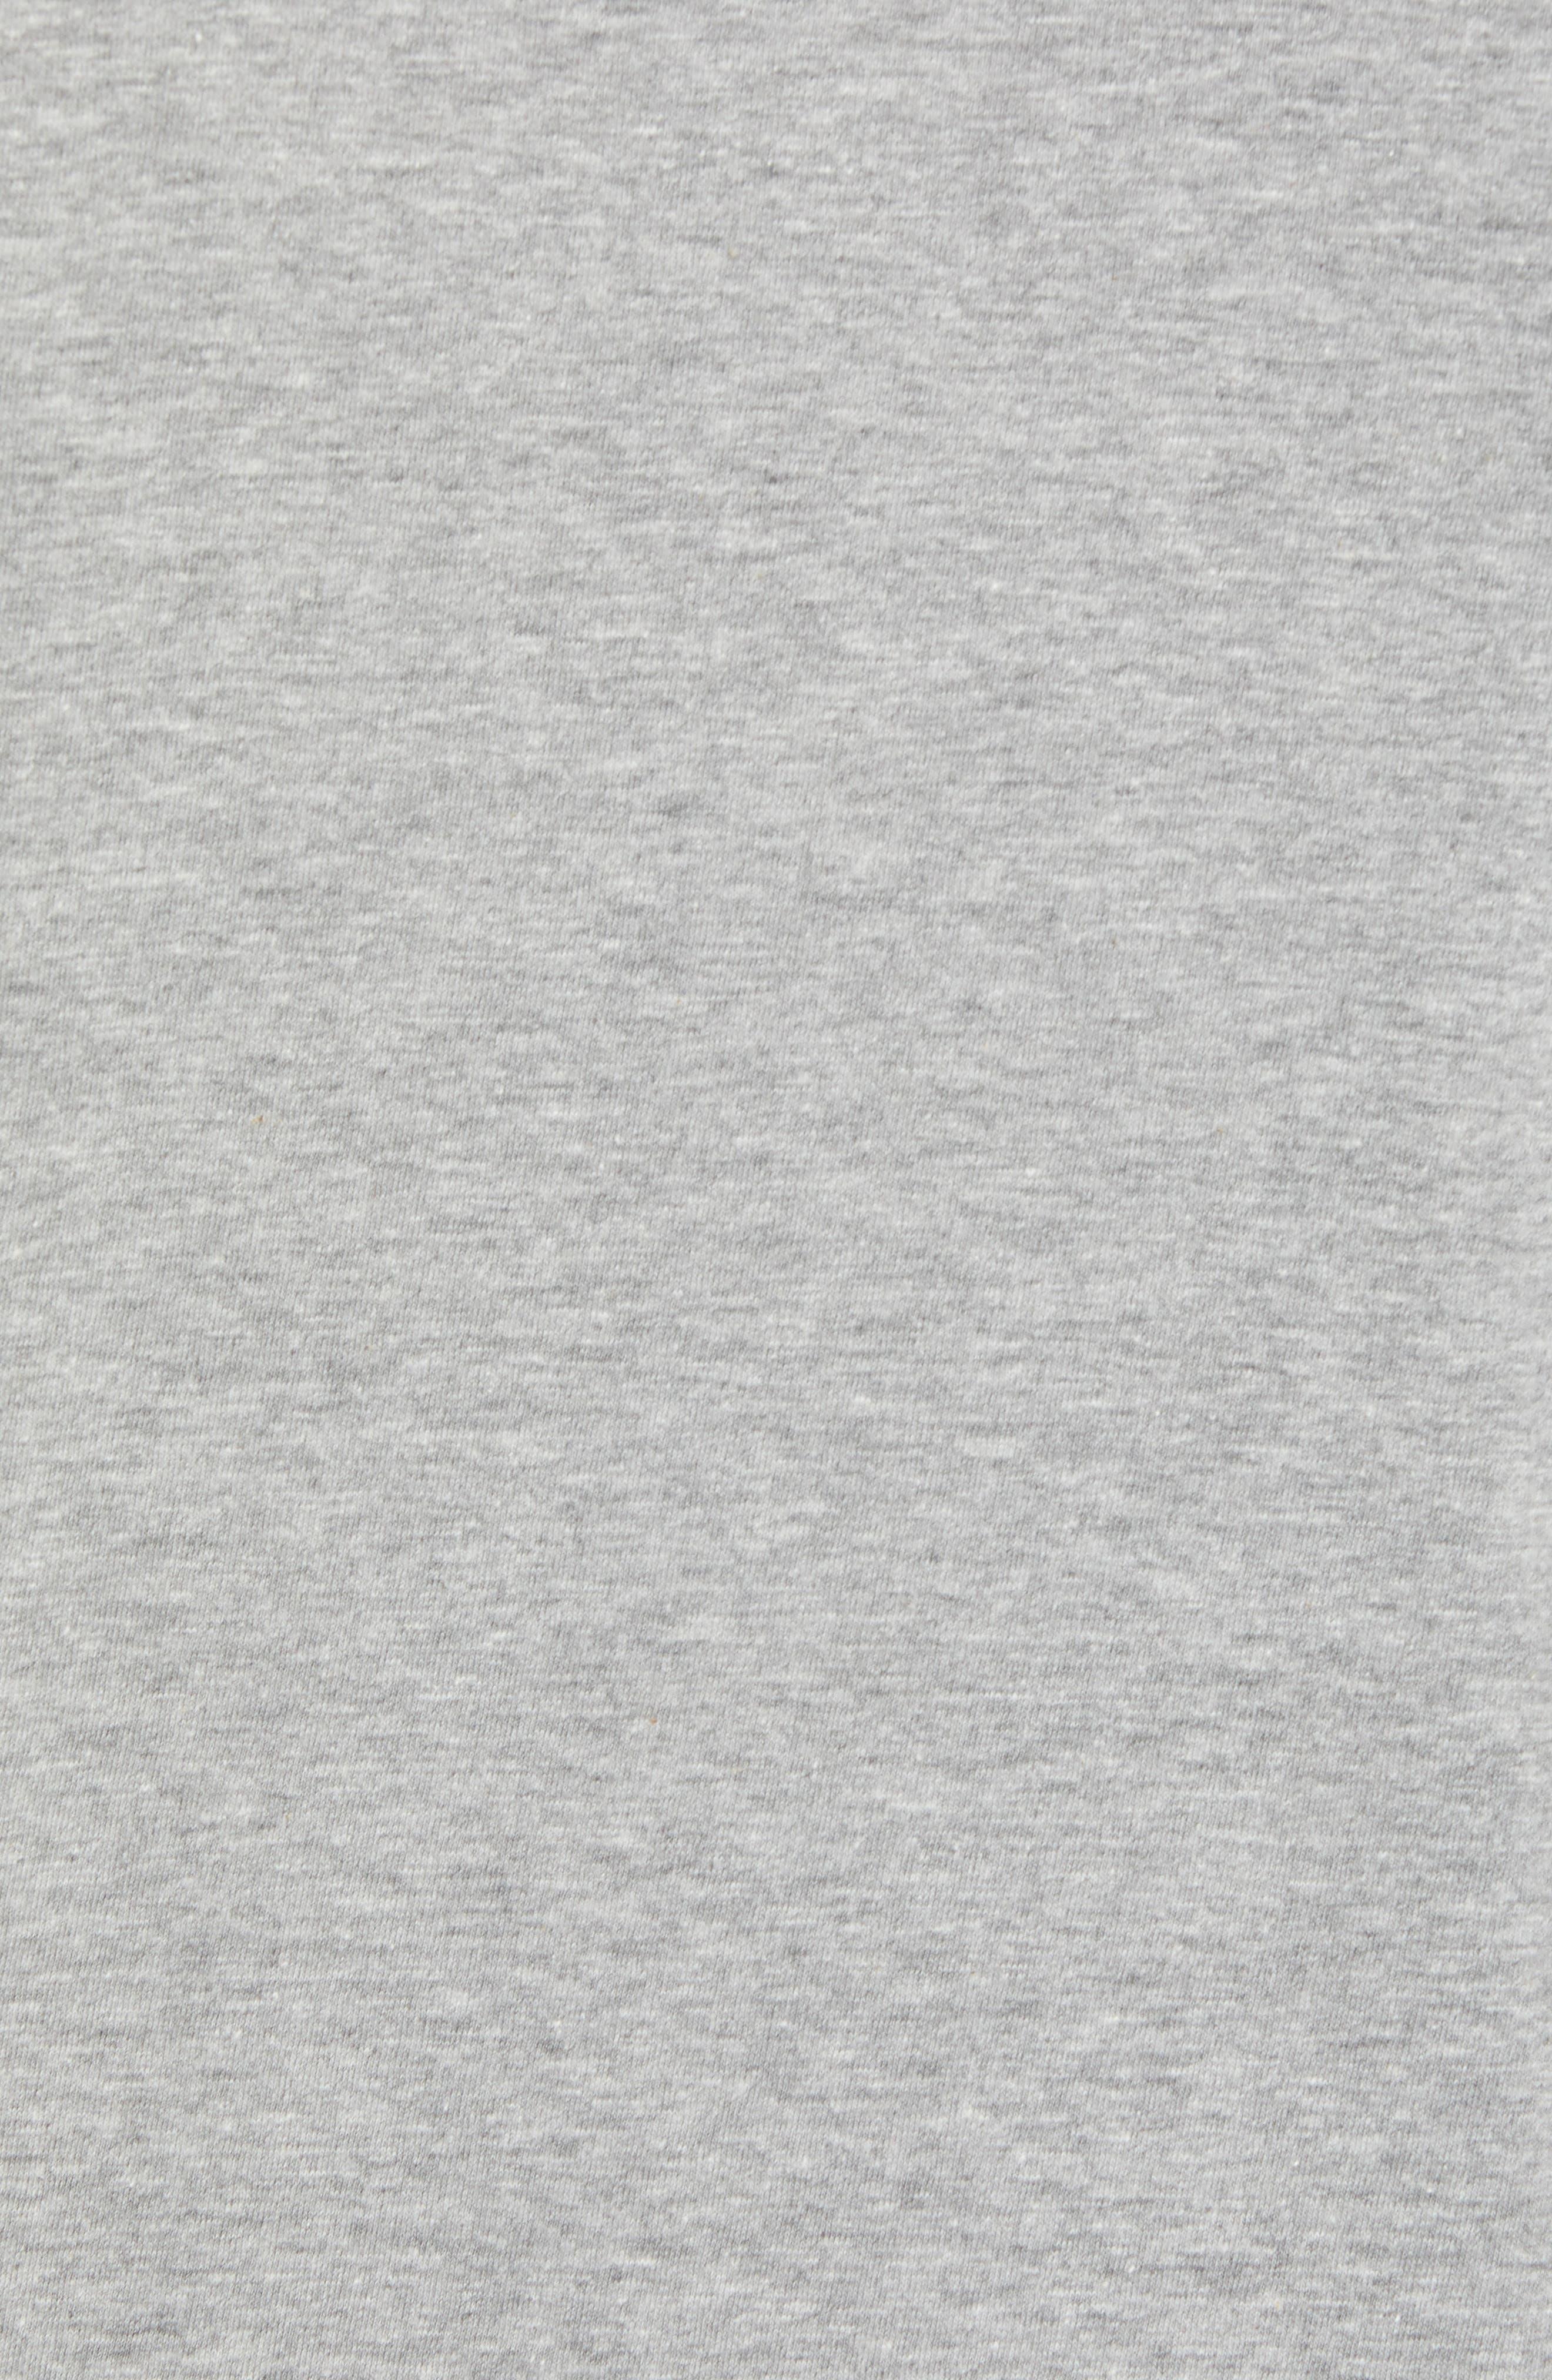 Sportswear More Money T-Shirt,                             Alternate thumbnail 5, color,                             DK GREY HEATHER/ BLACK